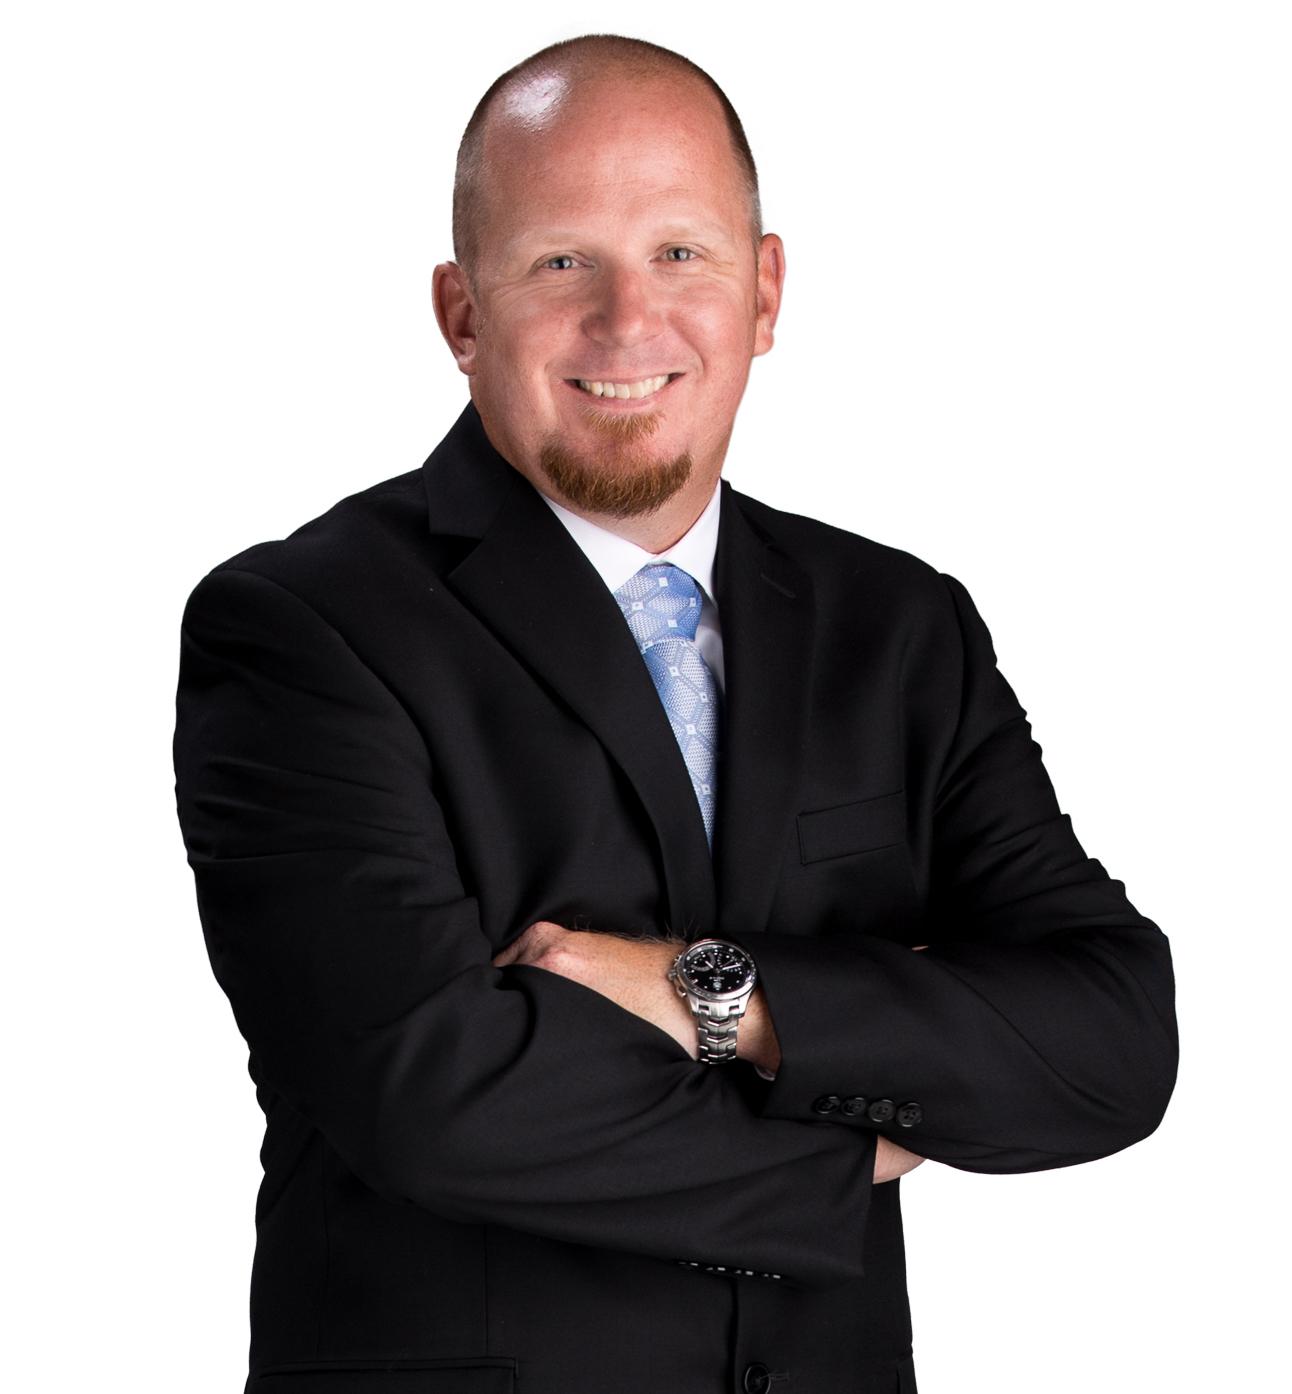 JEFF BULMAN - Broker / Owner